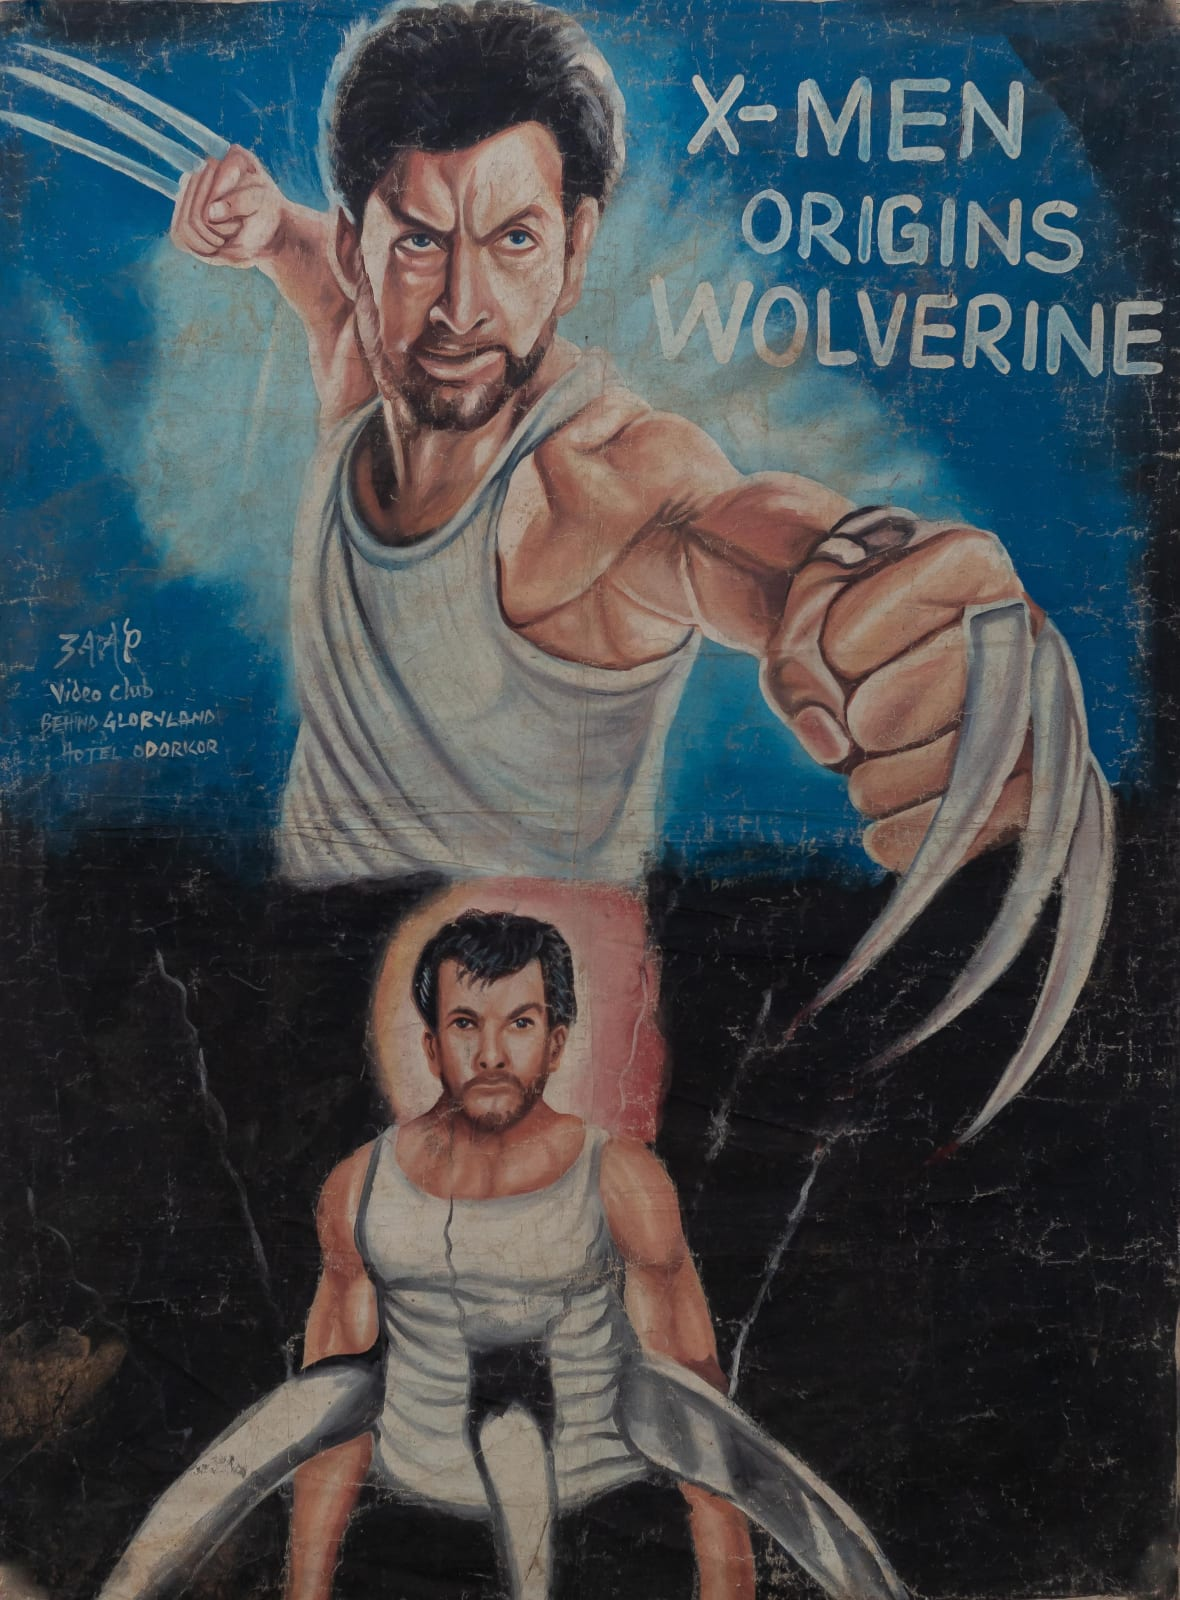 X-Men Original Wolverine 150 x 103 cm